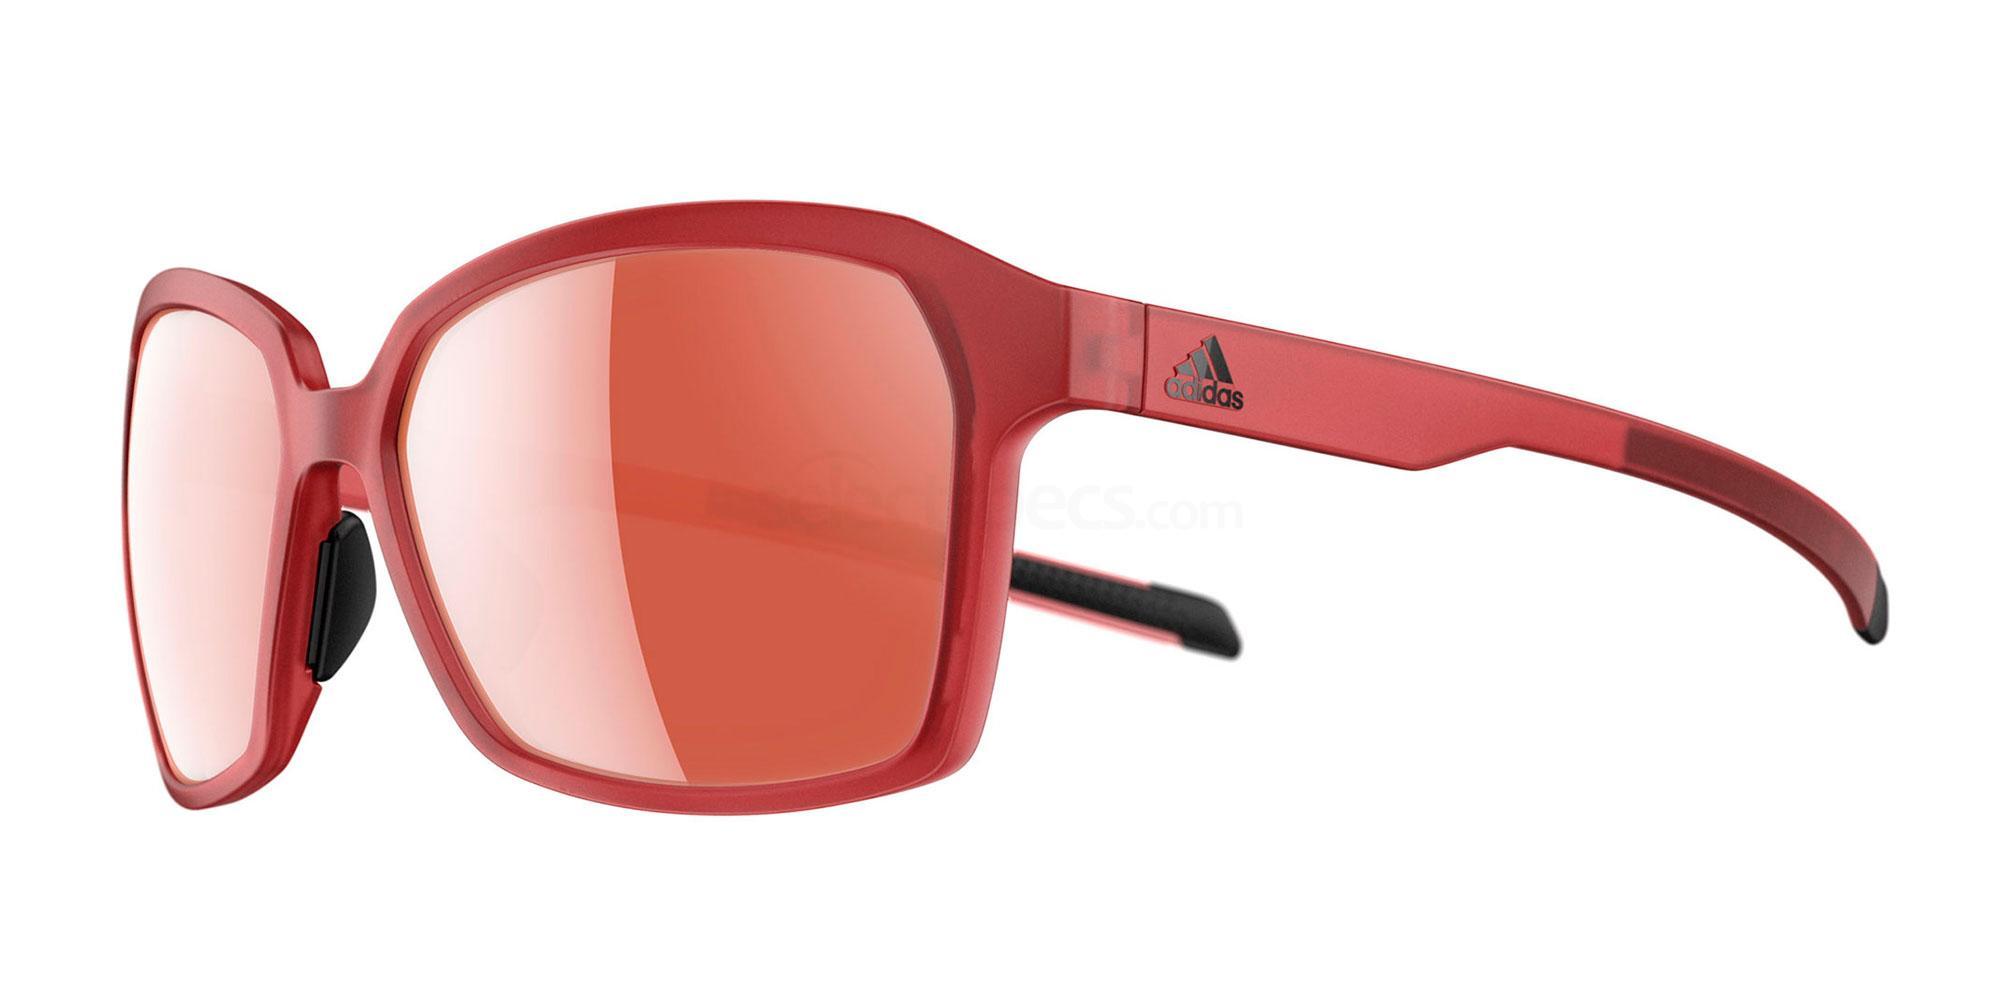 ad45 75 3500 ad45 Aspyr Sunglasses, Adidas